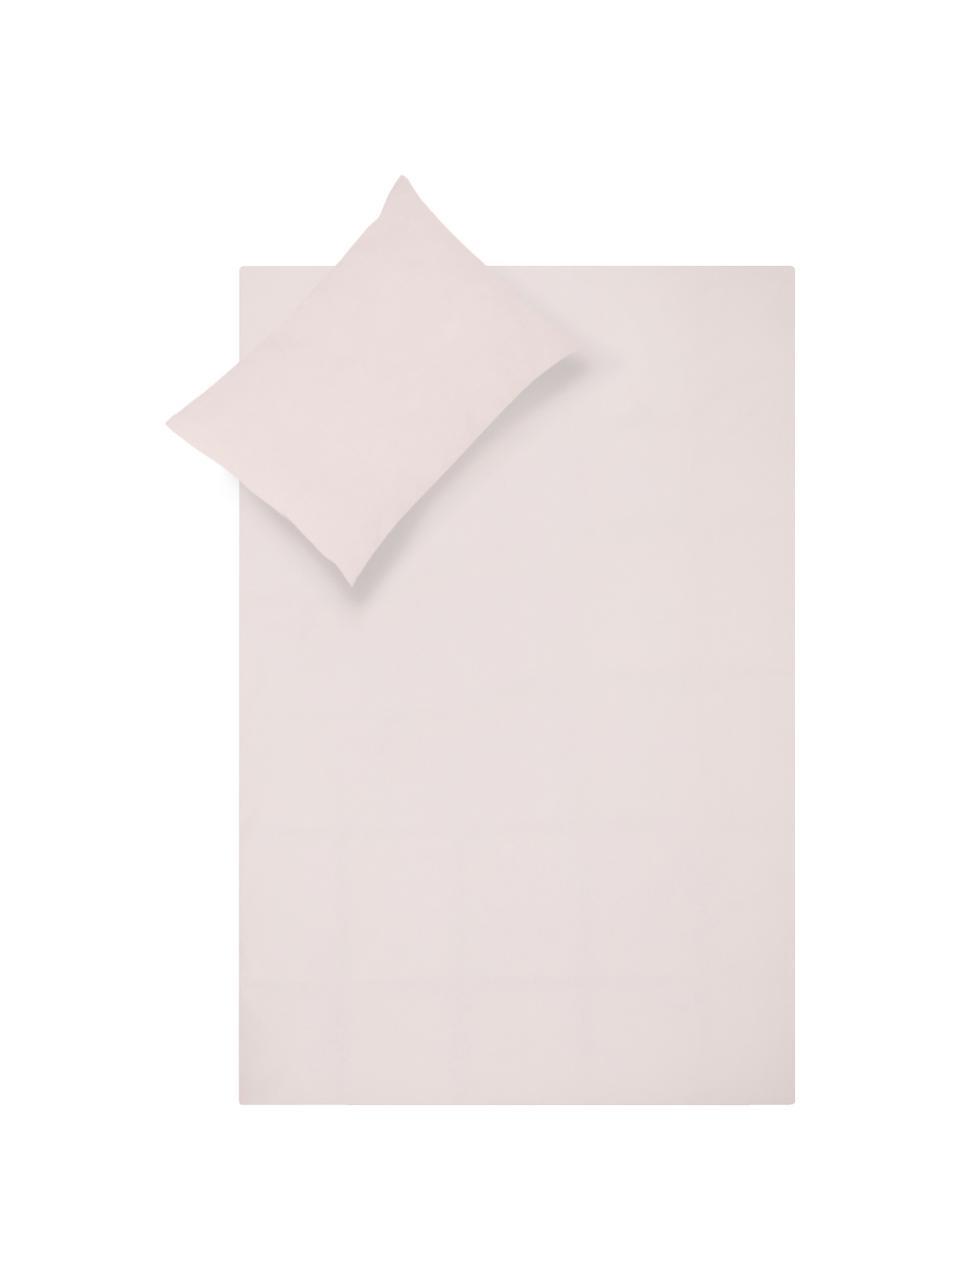 Set lenzuola in percalle Elsie, Tessuto: percalle Densità del filo, Rosa, 240 x 300 cm